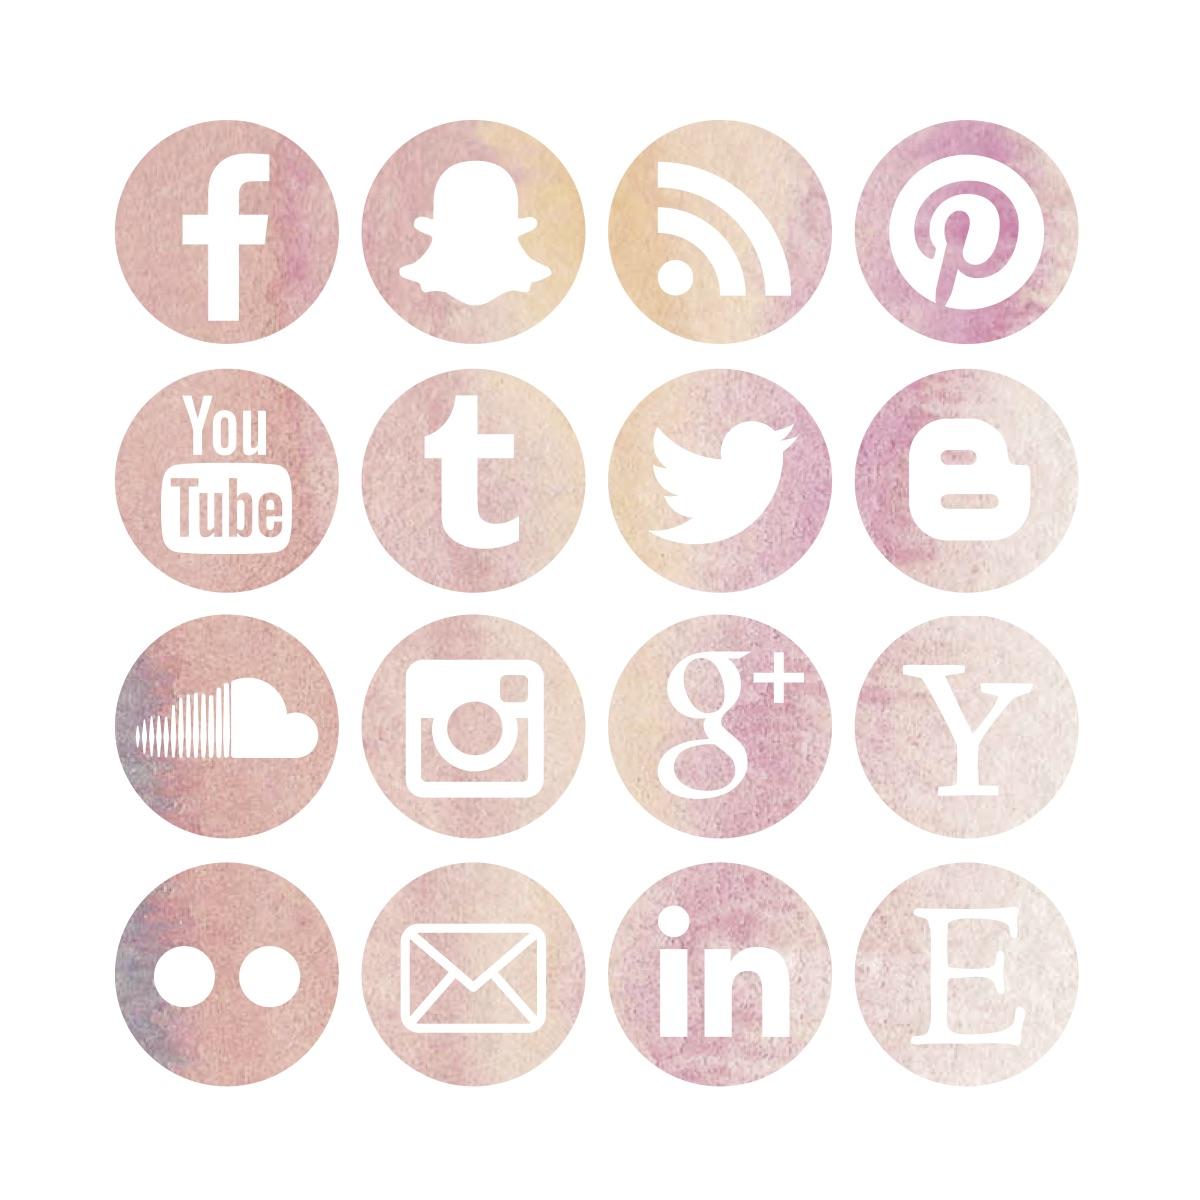 Bloguettes-SocialMediaIcons-PinkWatercolorCircles.jpg